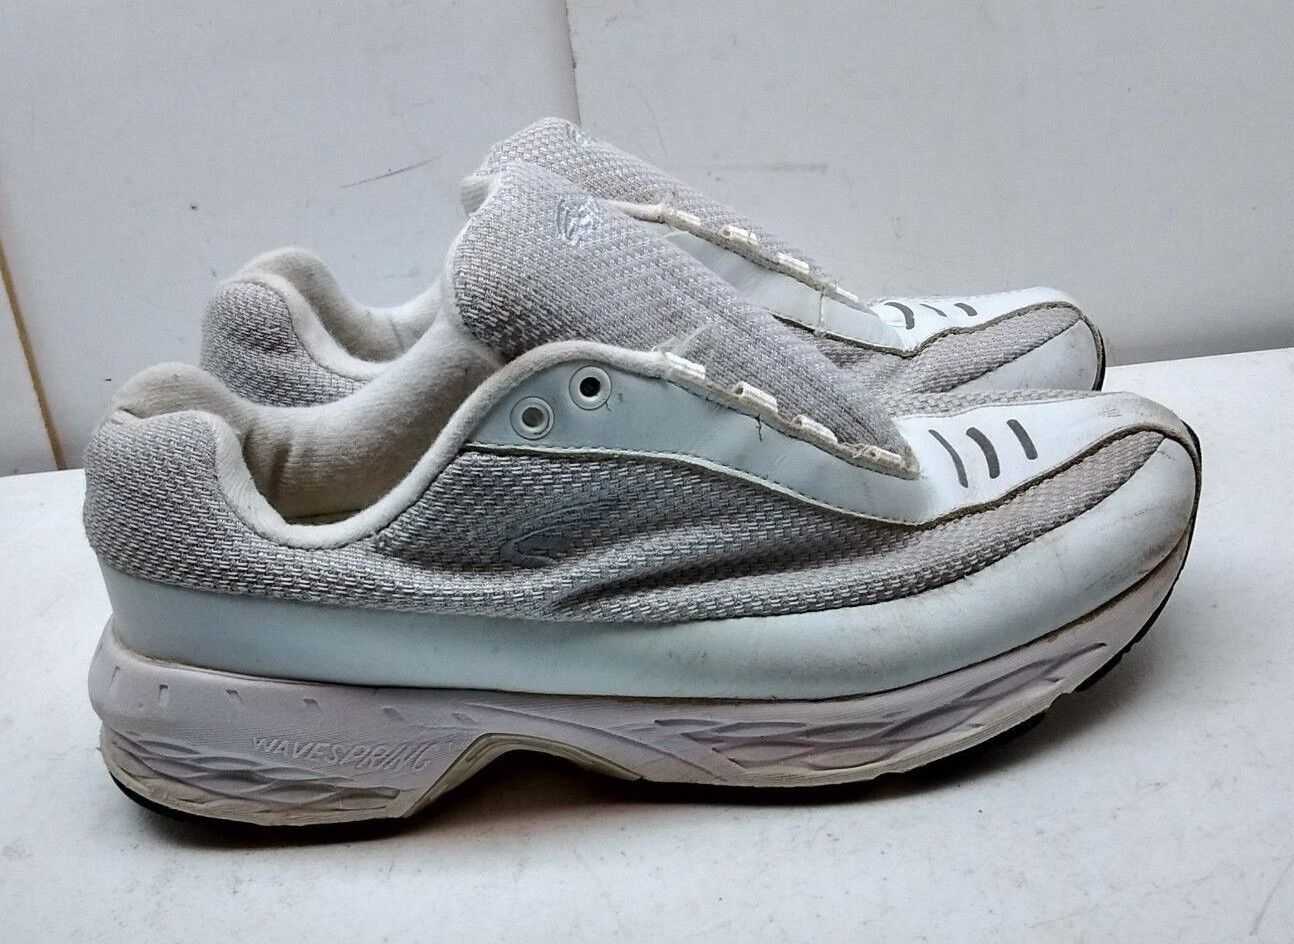 Spira mujer blanco cuero tape Oxford perforation para caminar calzado 9,5 m 41